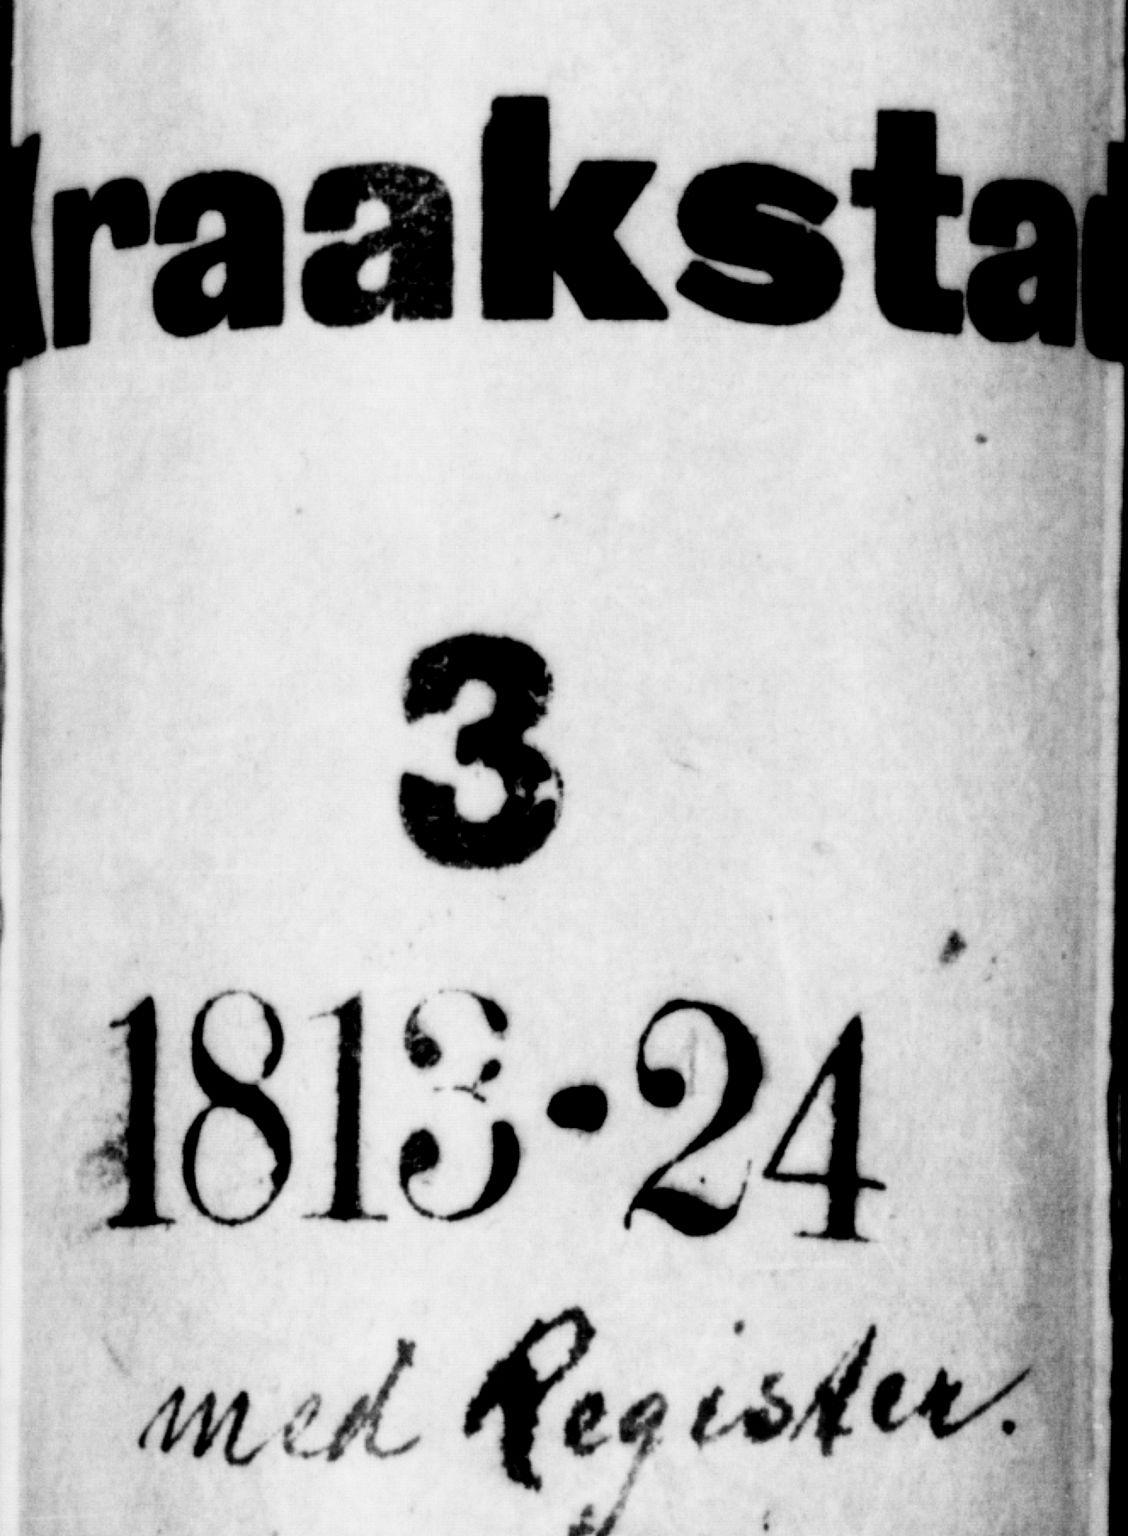 SAO, Kråkstad prestekontor Kirkebøker, F/Fa/L0003: Ministerialbok nr. I 3, 1813-1824